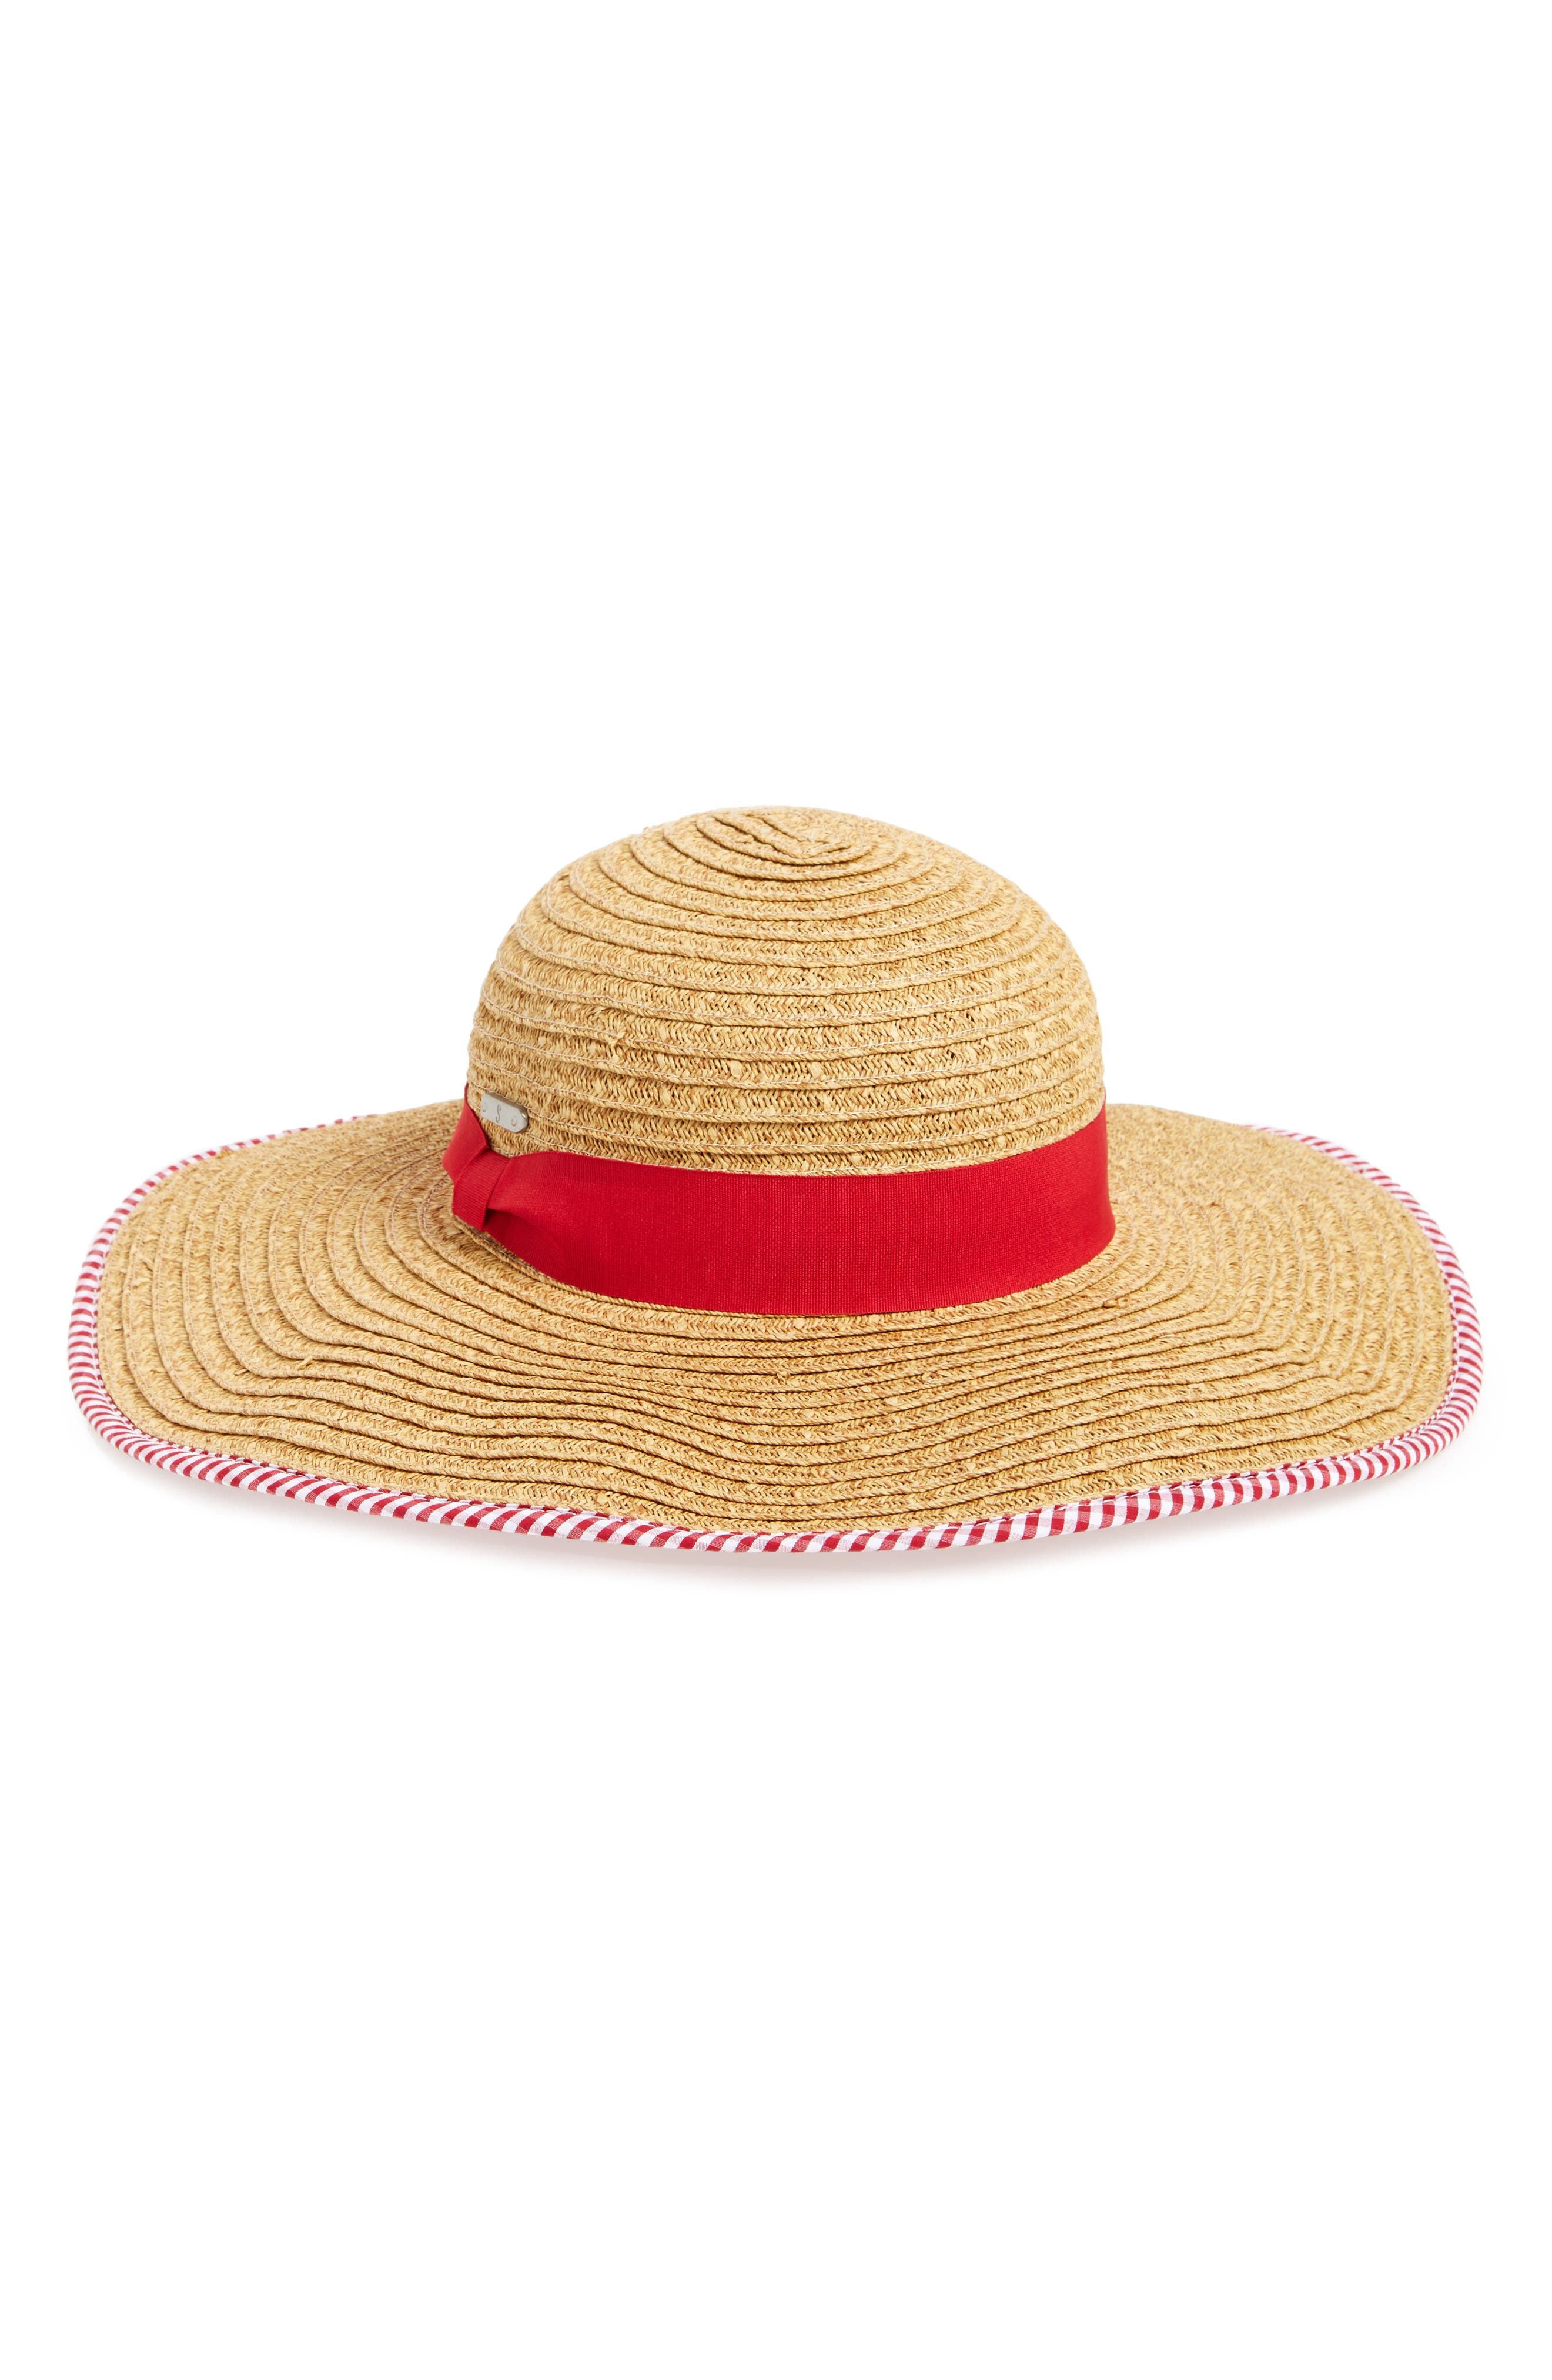 San Diego Hat Floppy Straw Hat